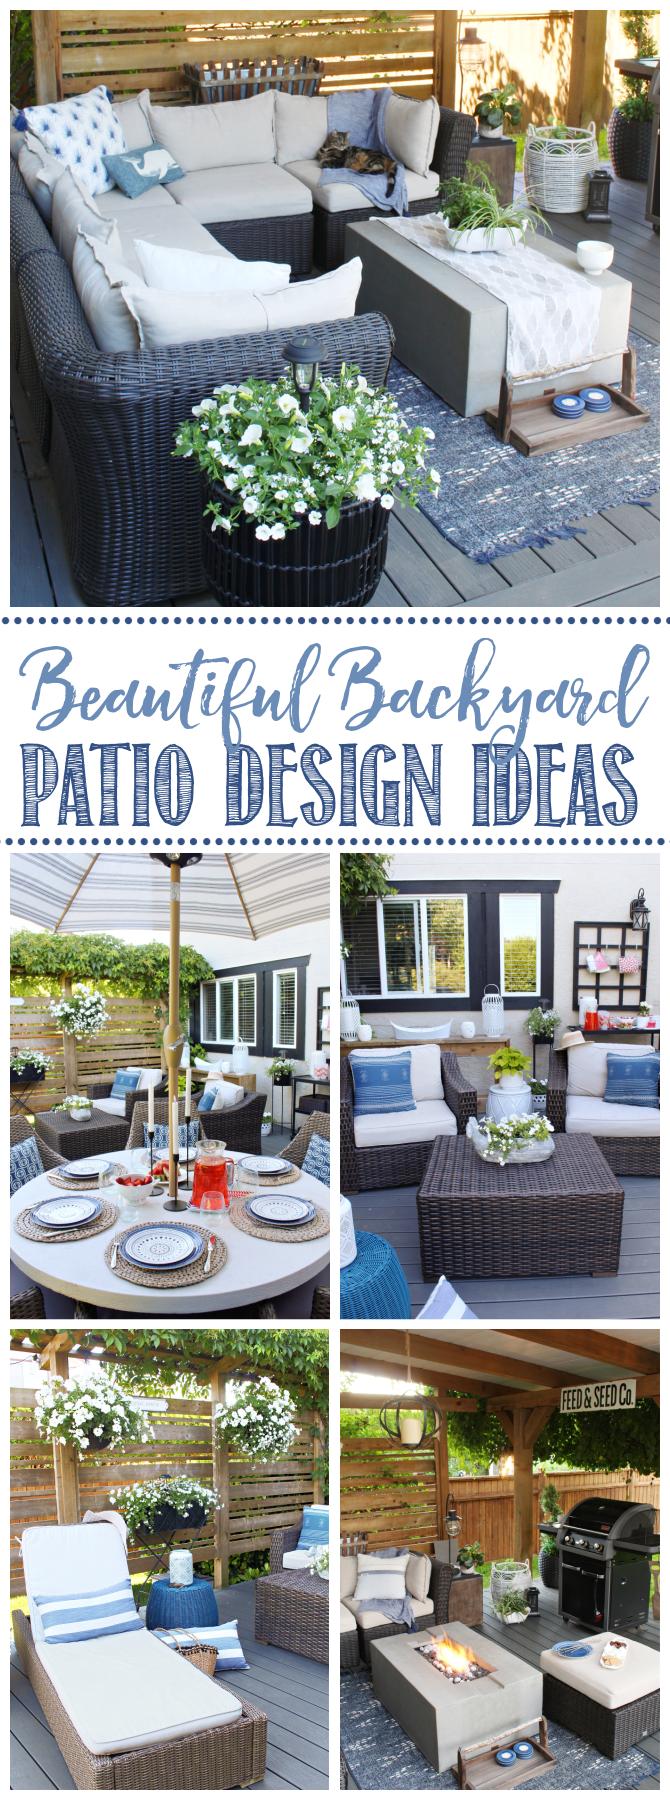 Collage of beautiful backyard patio ideas.